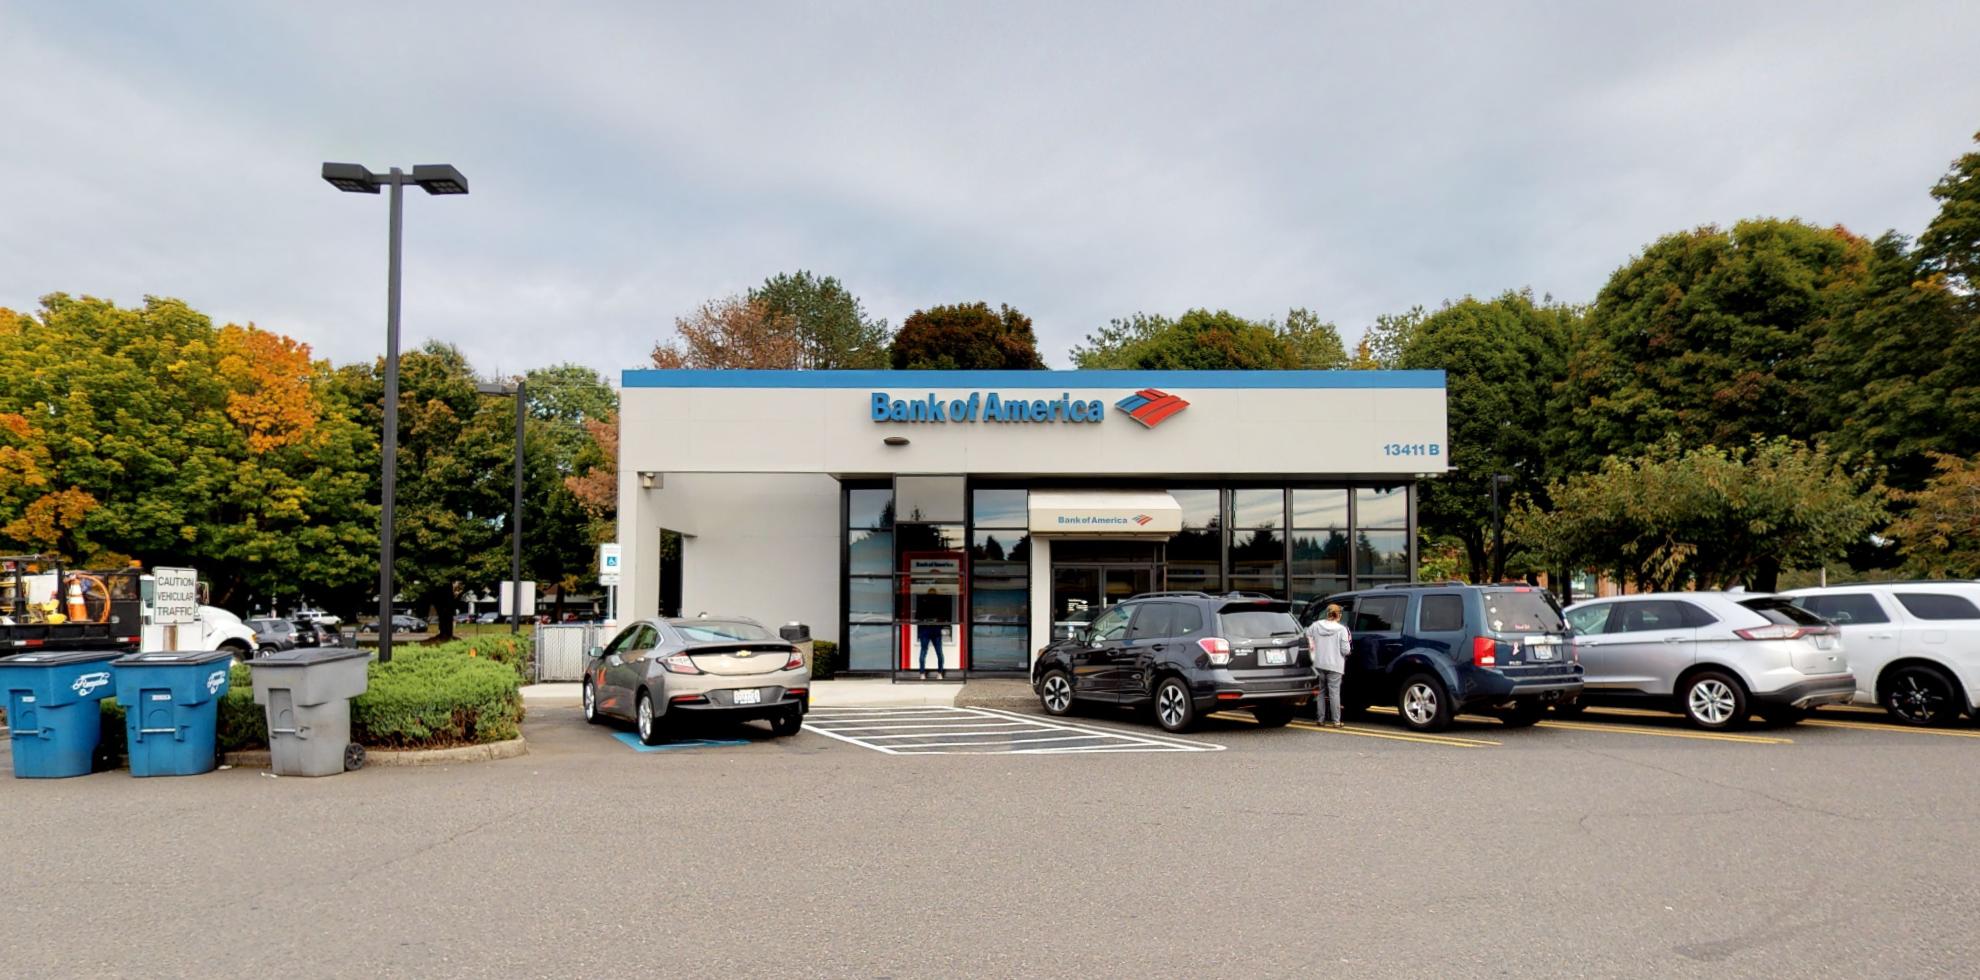 Bank of America financial center with drive-thru ATM   13411 SE Mill Plain Blvd STE B, Vancouver, WA 98684